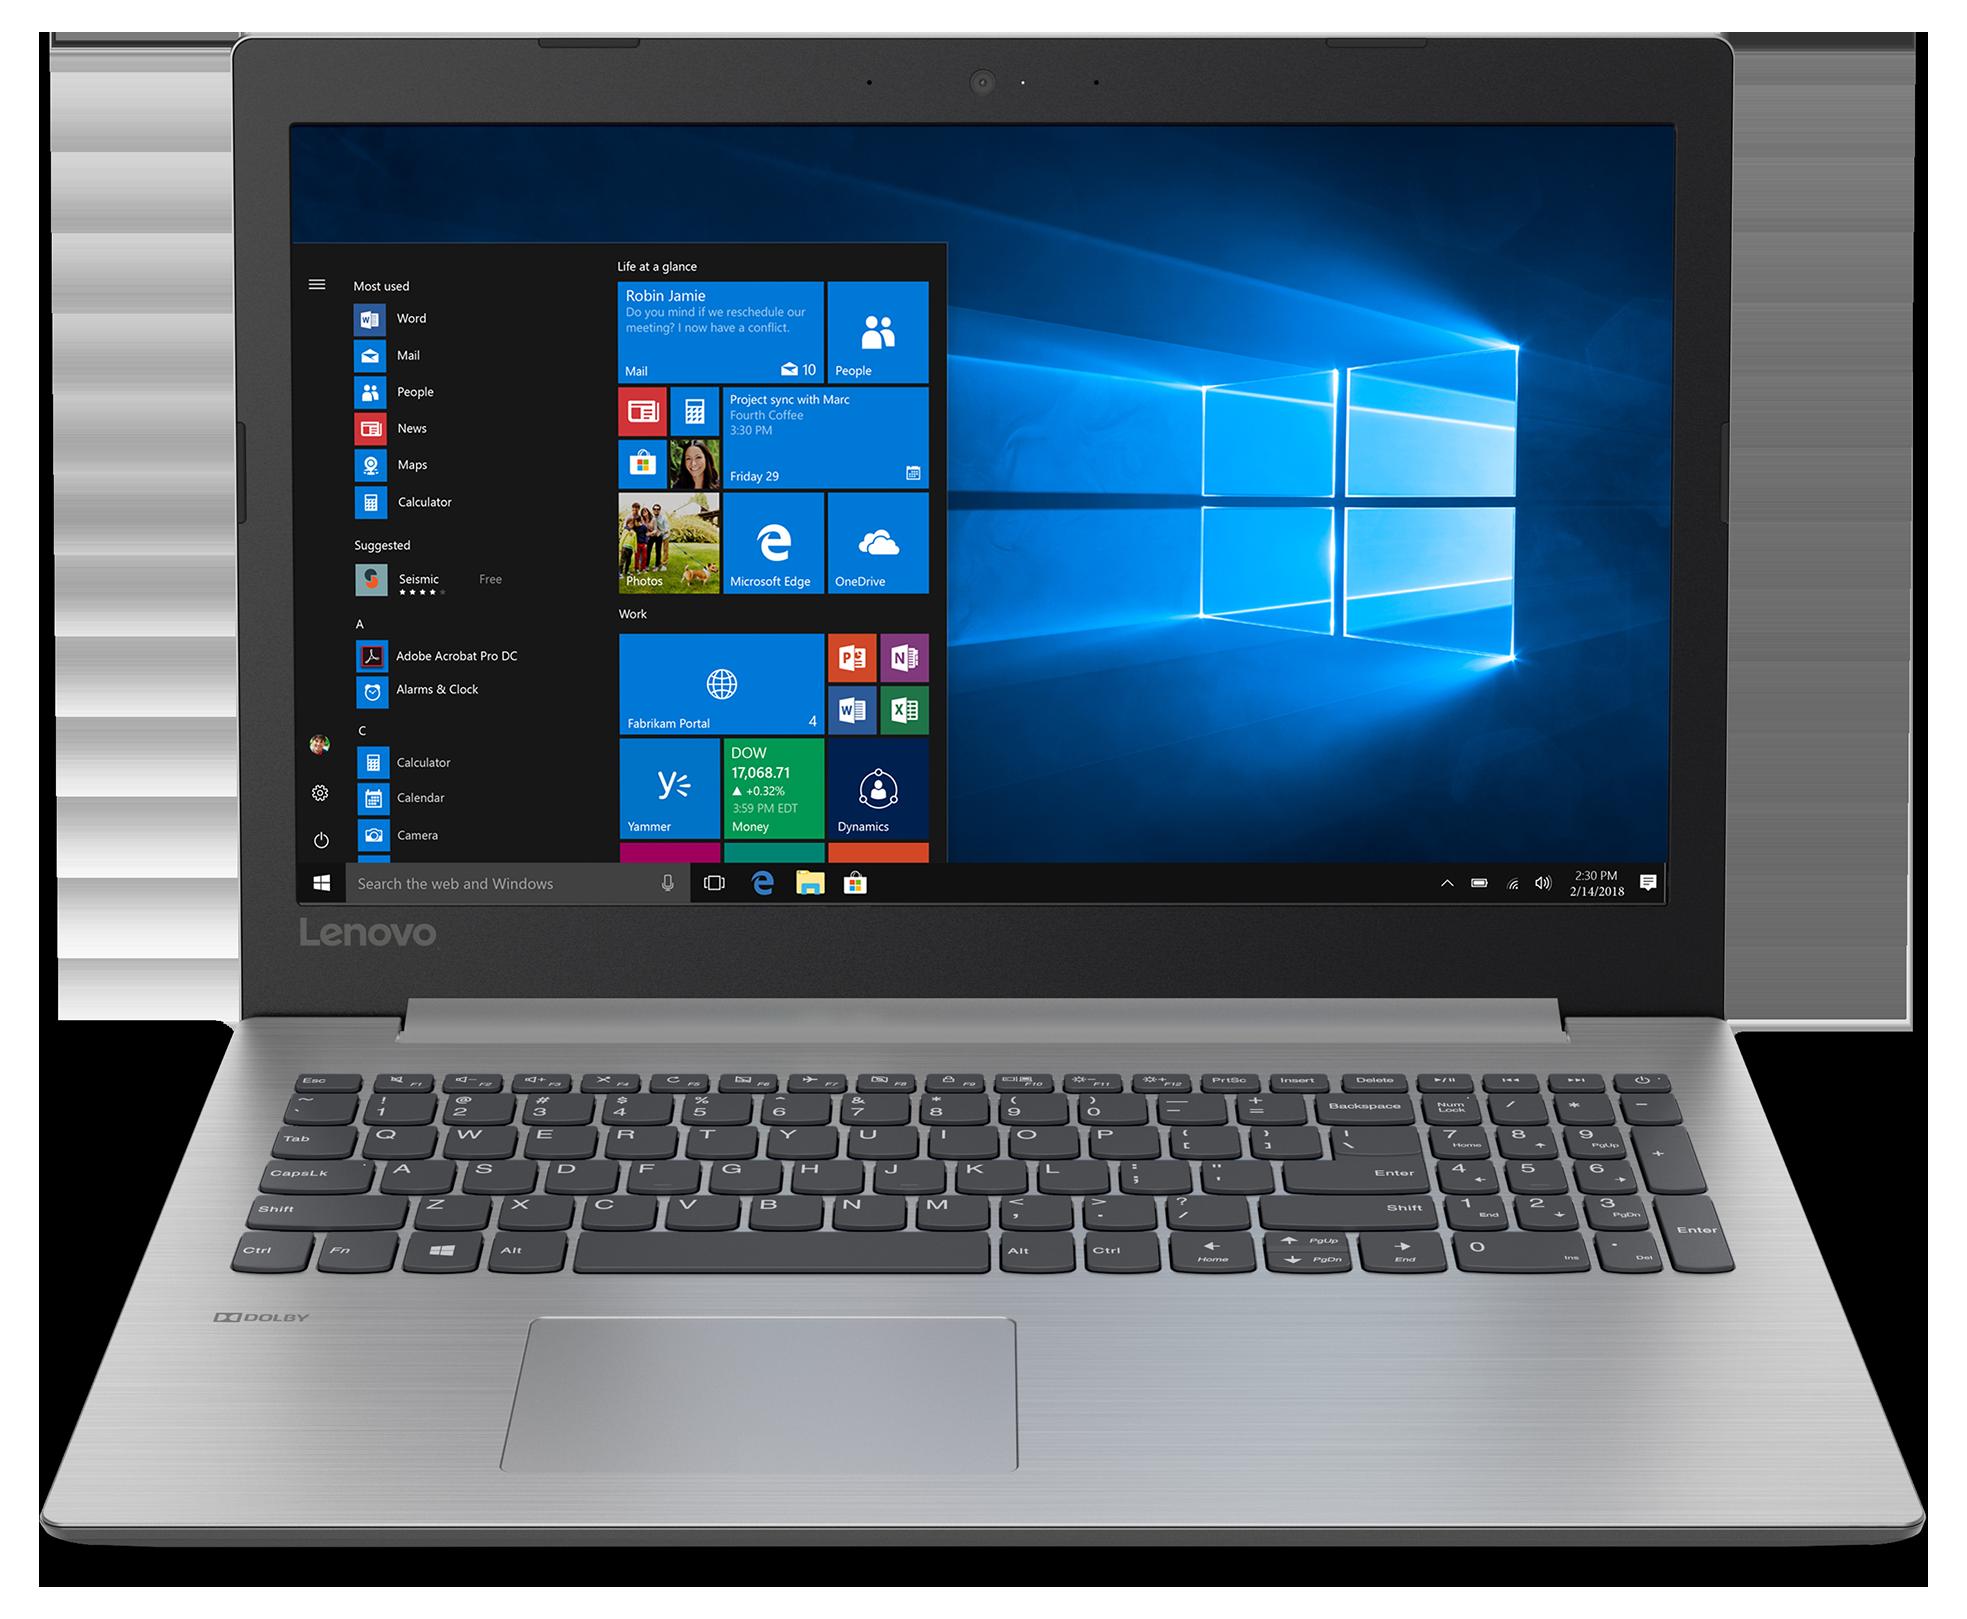 Lenovo IdeaPad 330 Touch 81DJ0008US Laptop